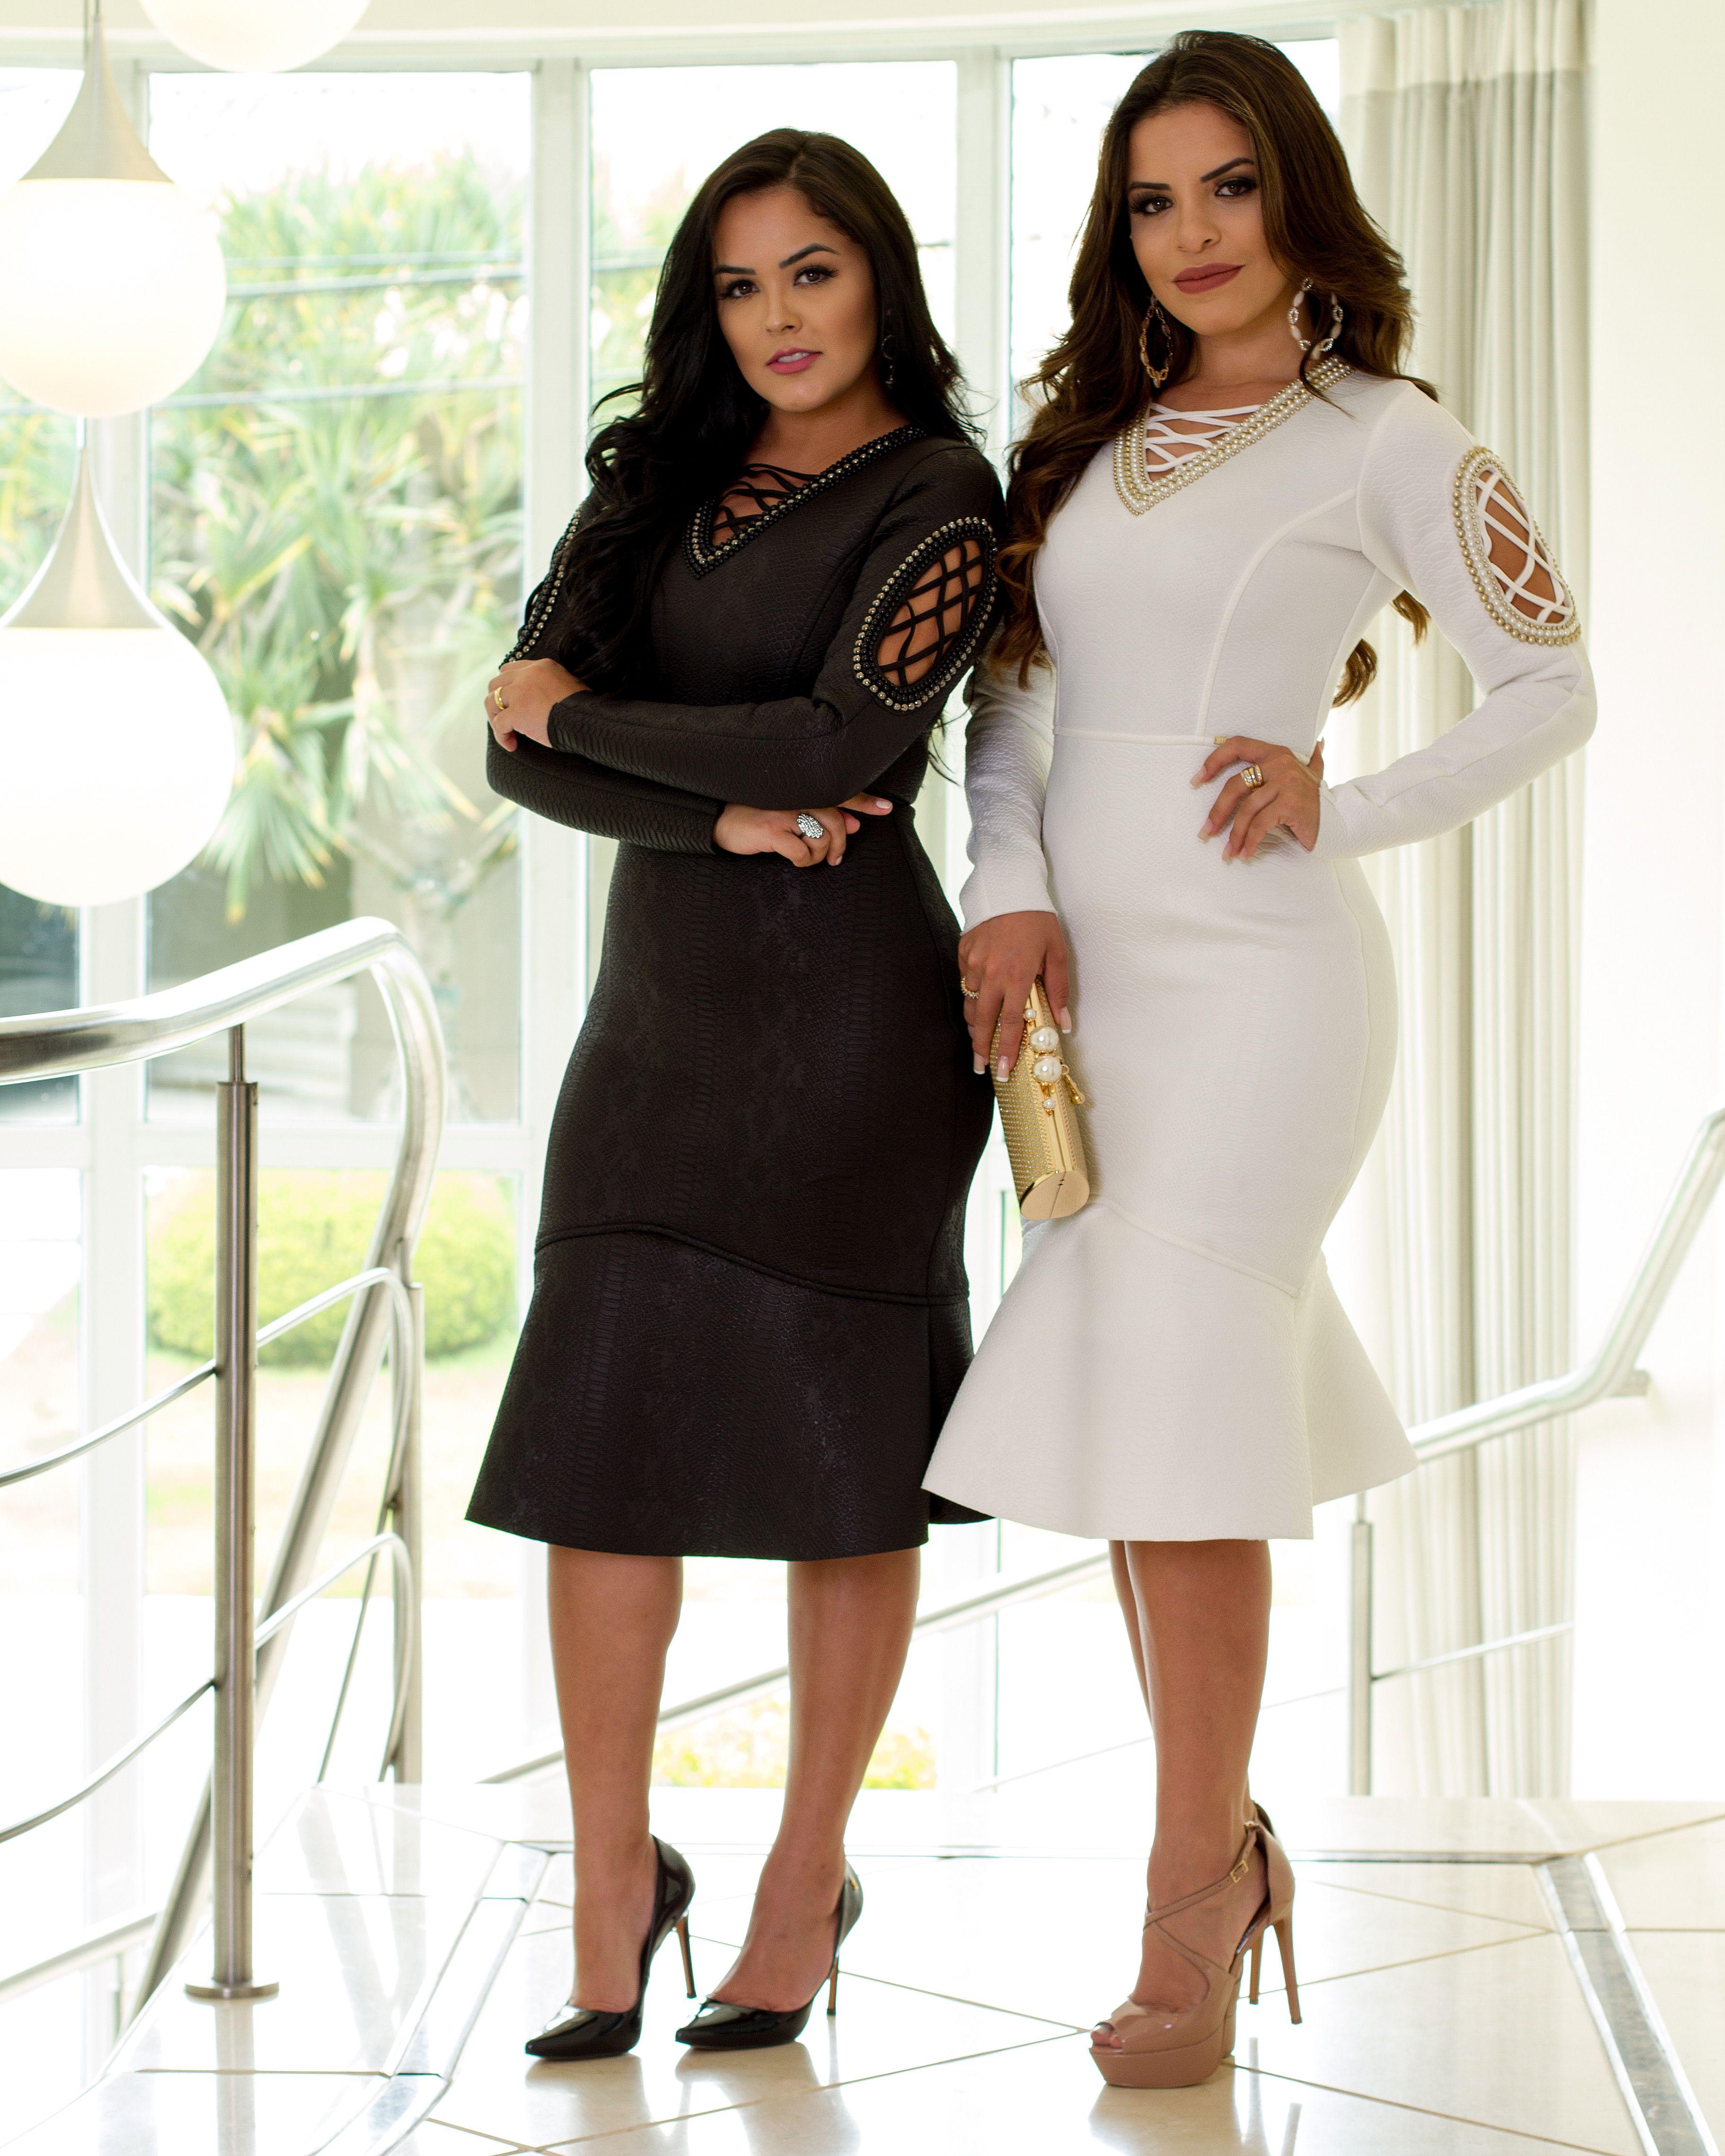 fc27128d5 Vestido | Roupas - Vestidos em 2019 | Trendy outfits, Dress suits e ...